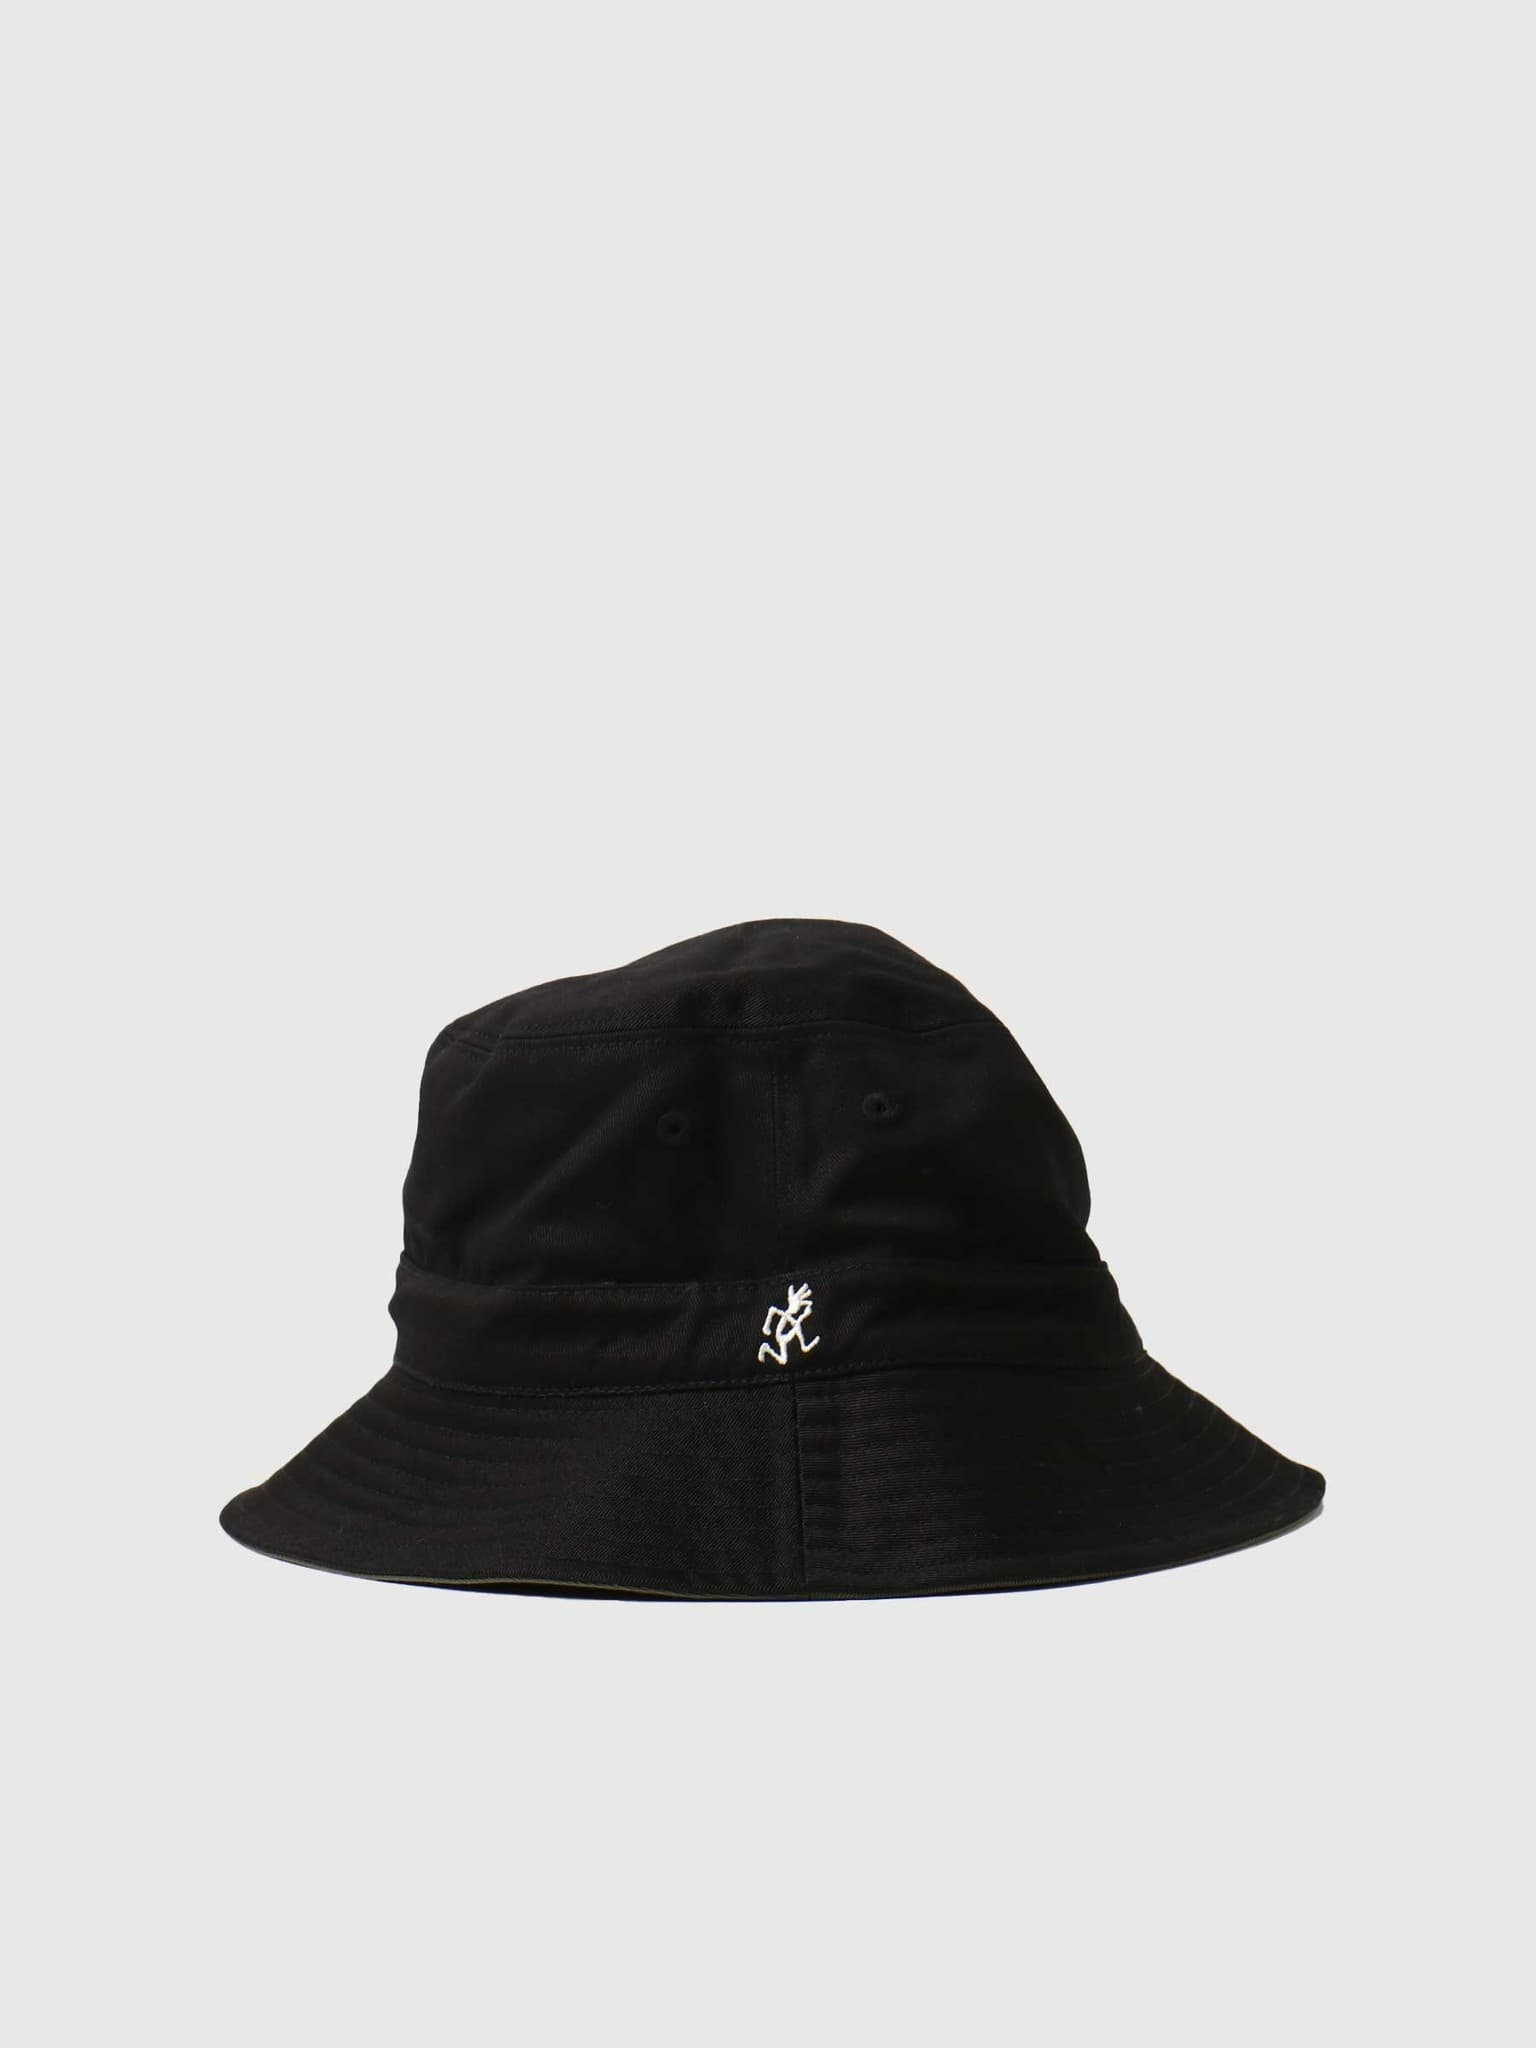 Reversible Hat Olive X Black GAC-21S073